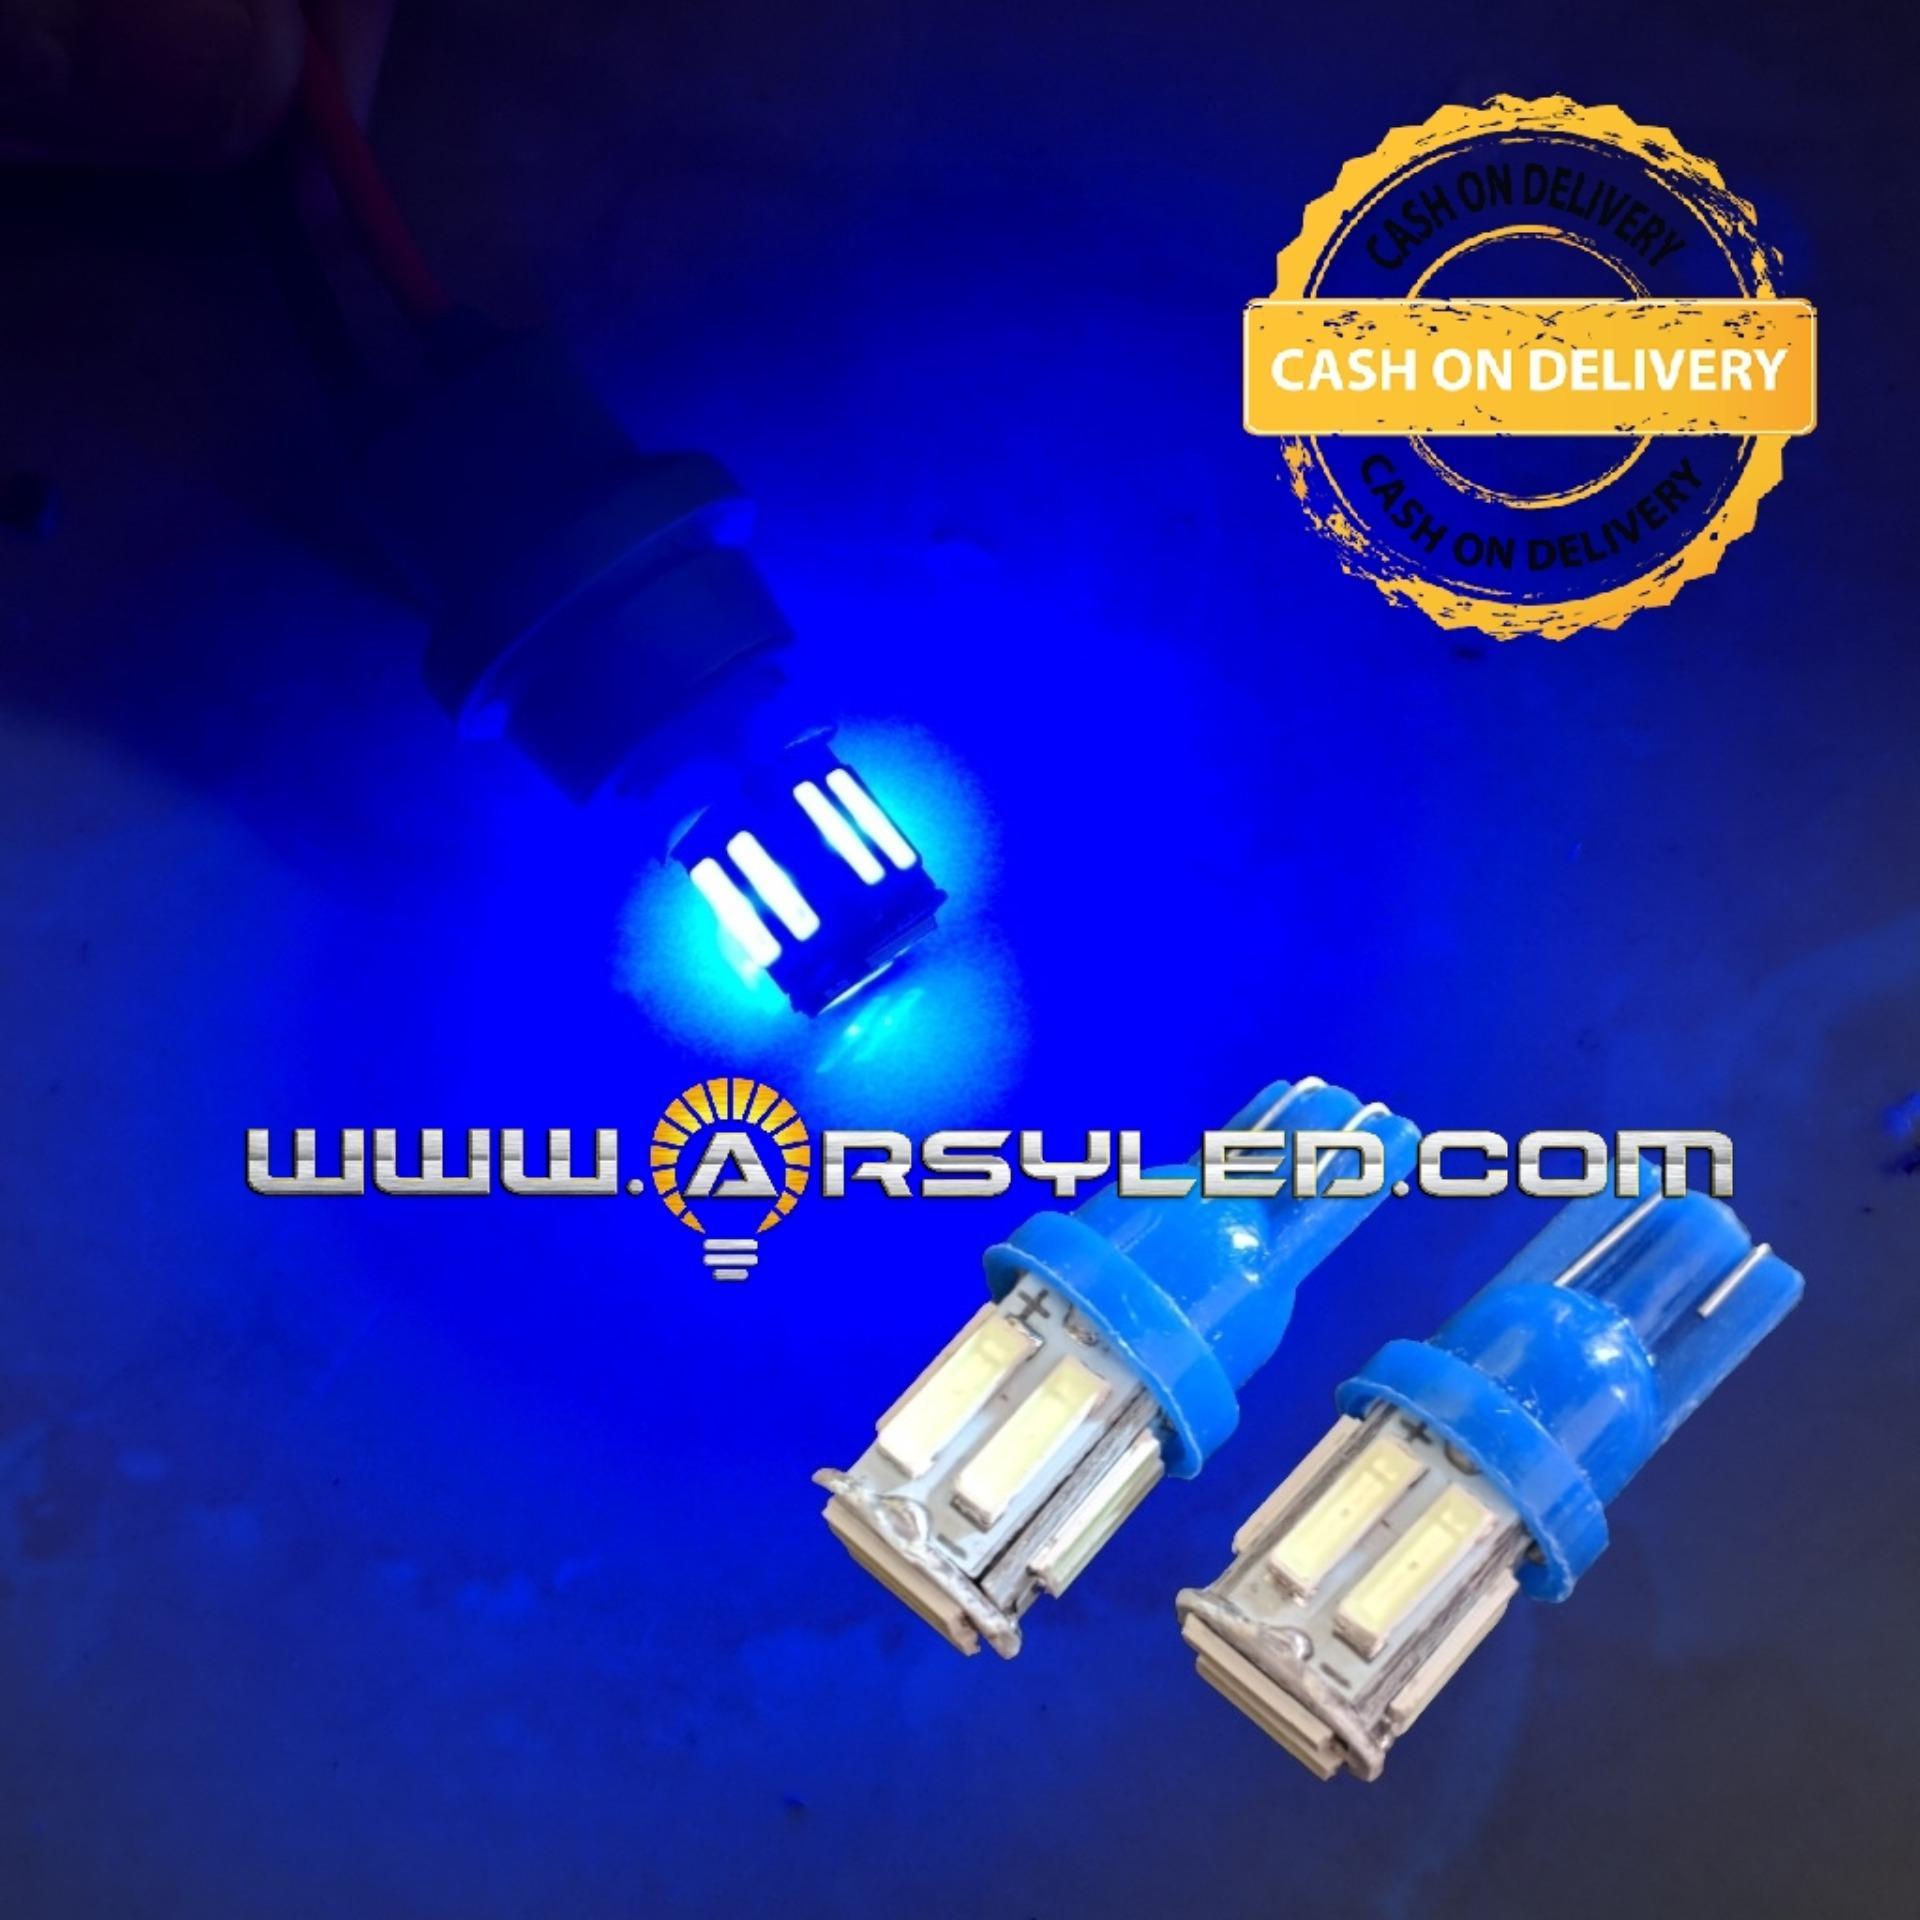 2 Biji Lampu Led Motor Nmax Beat Vario Mio Supra Scoopy T10 7014 10 TITIK Senja Sein ARSYSTORE - BIRU